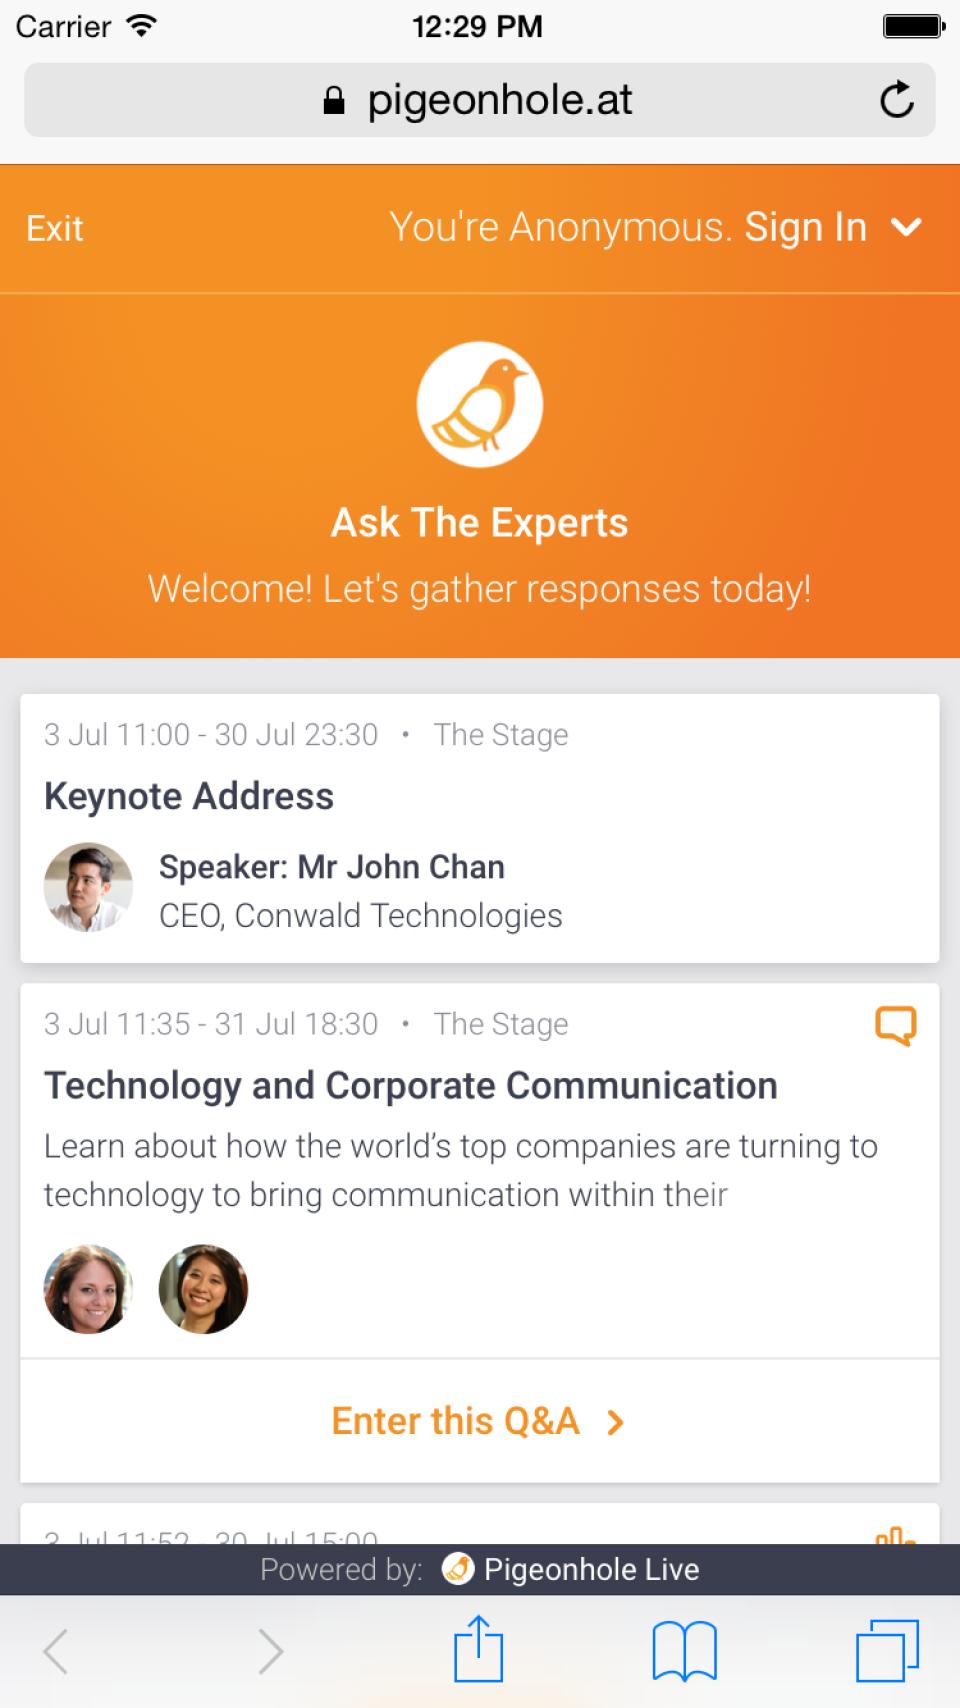 Full event agenda complete with session description and speaker profiles